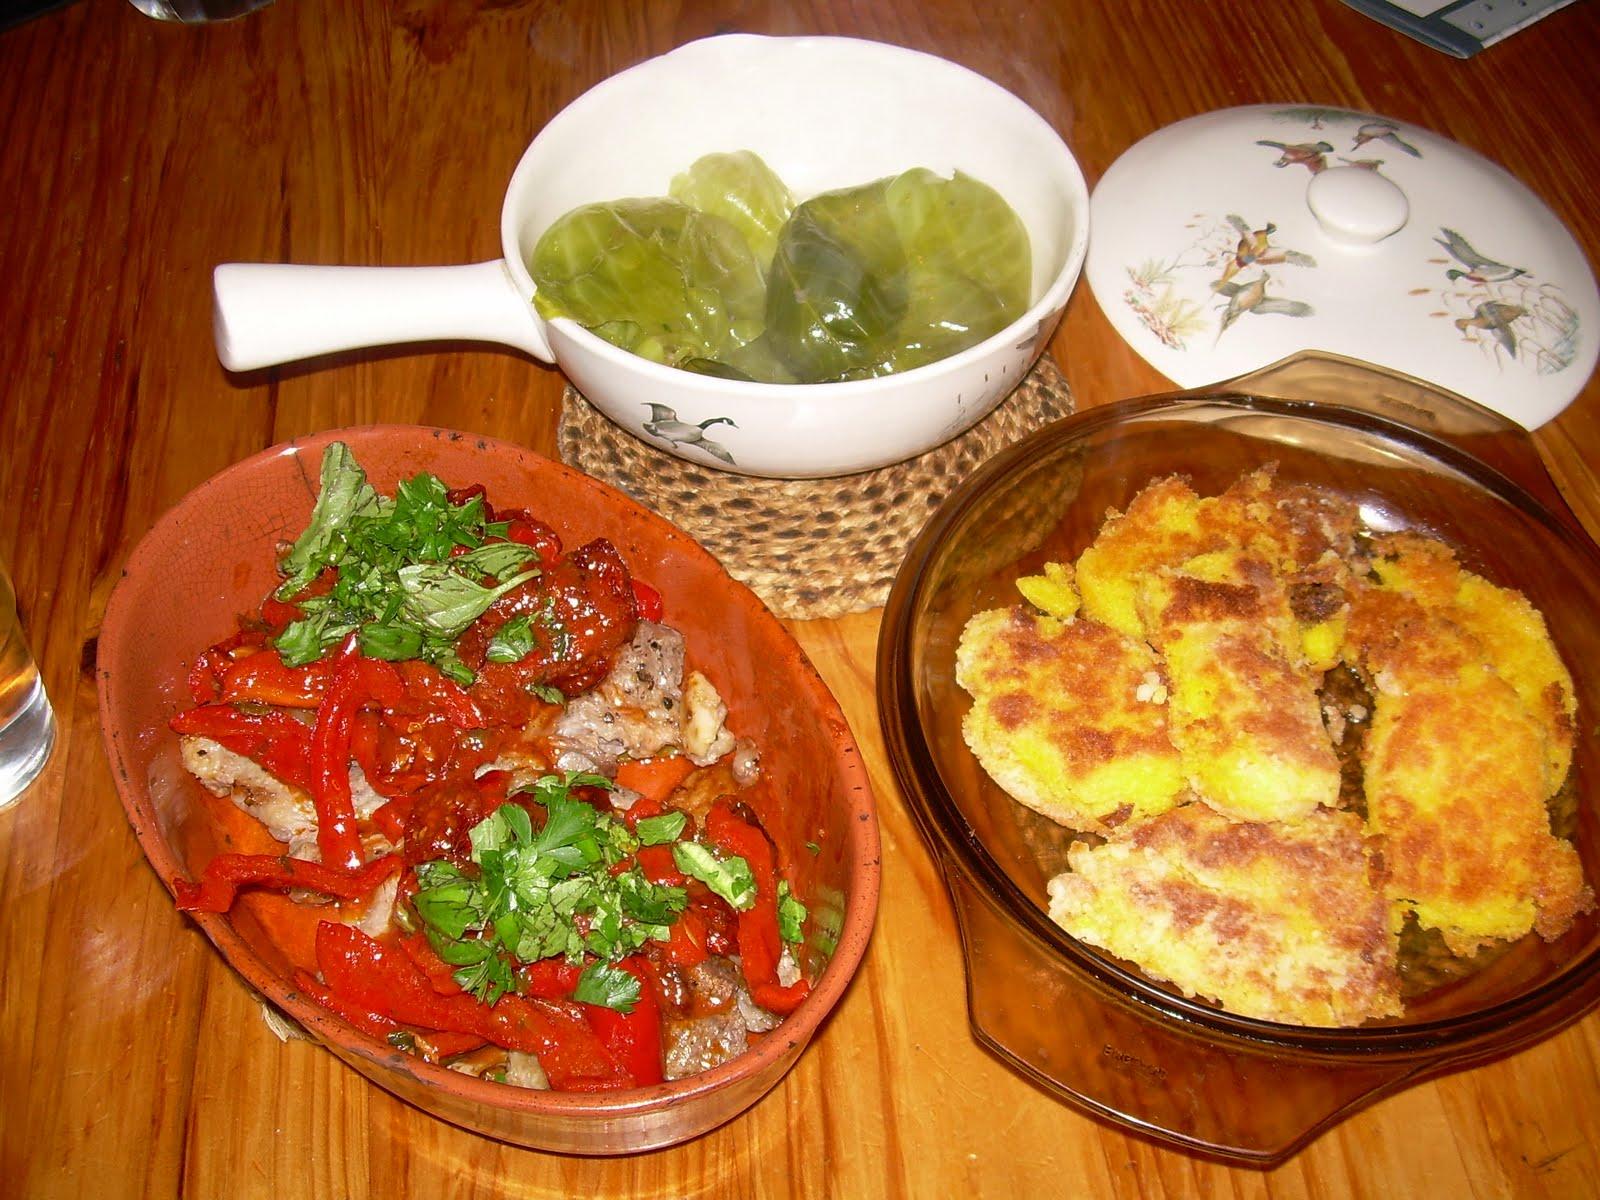 A la mode frangourou home made millas toulouse cornmeal fritters - Cuisine a la mode ...